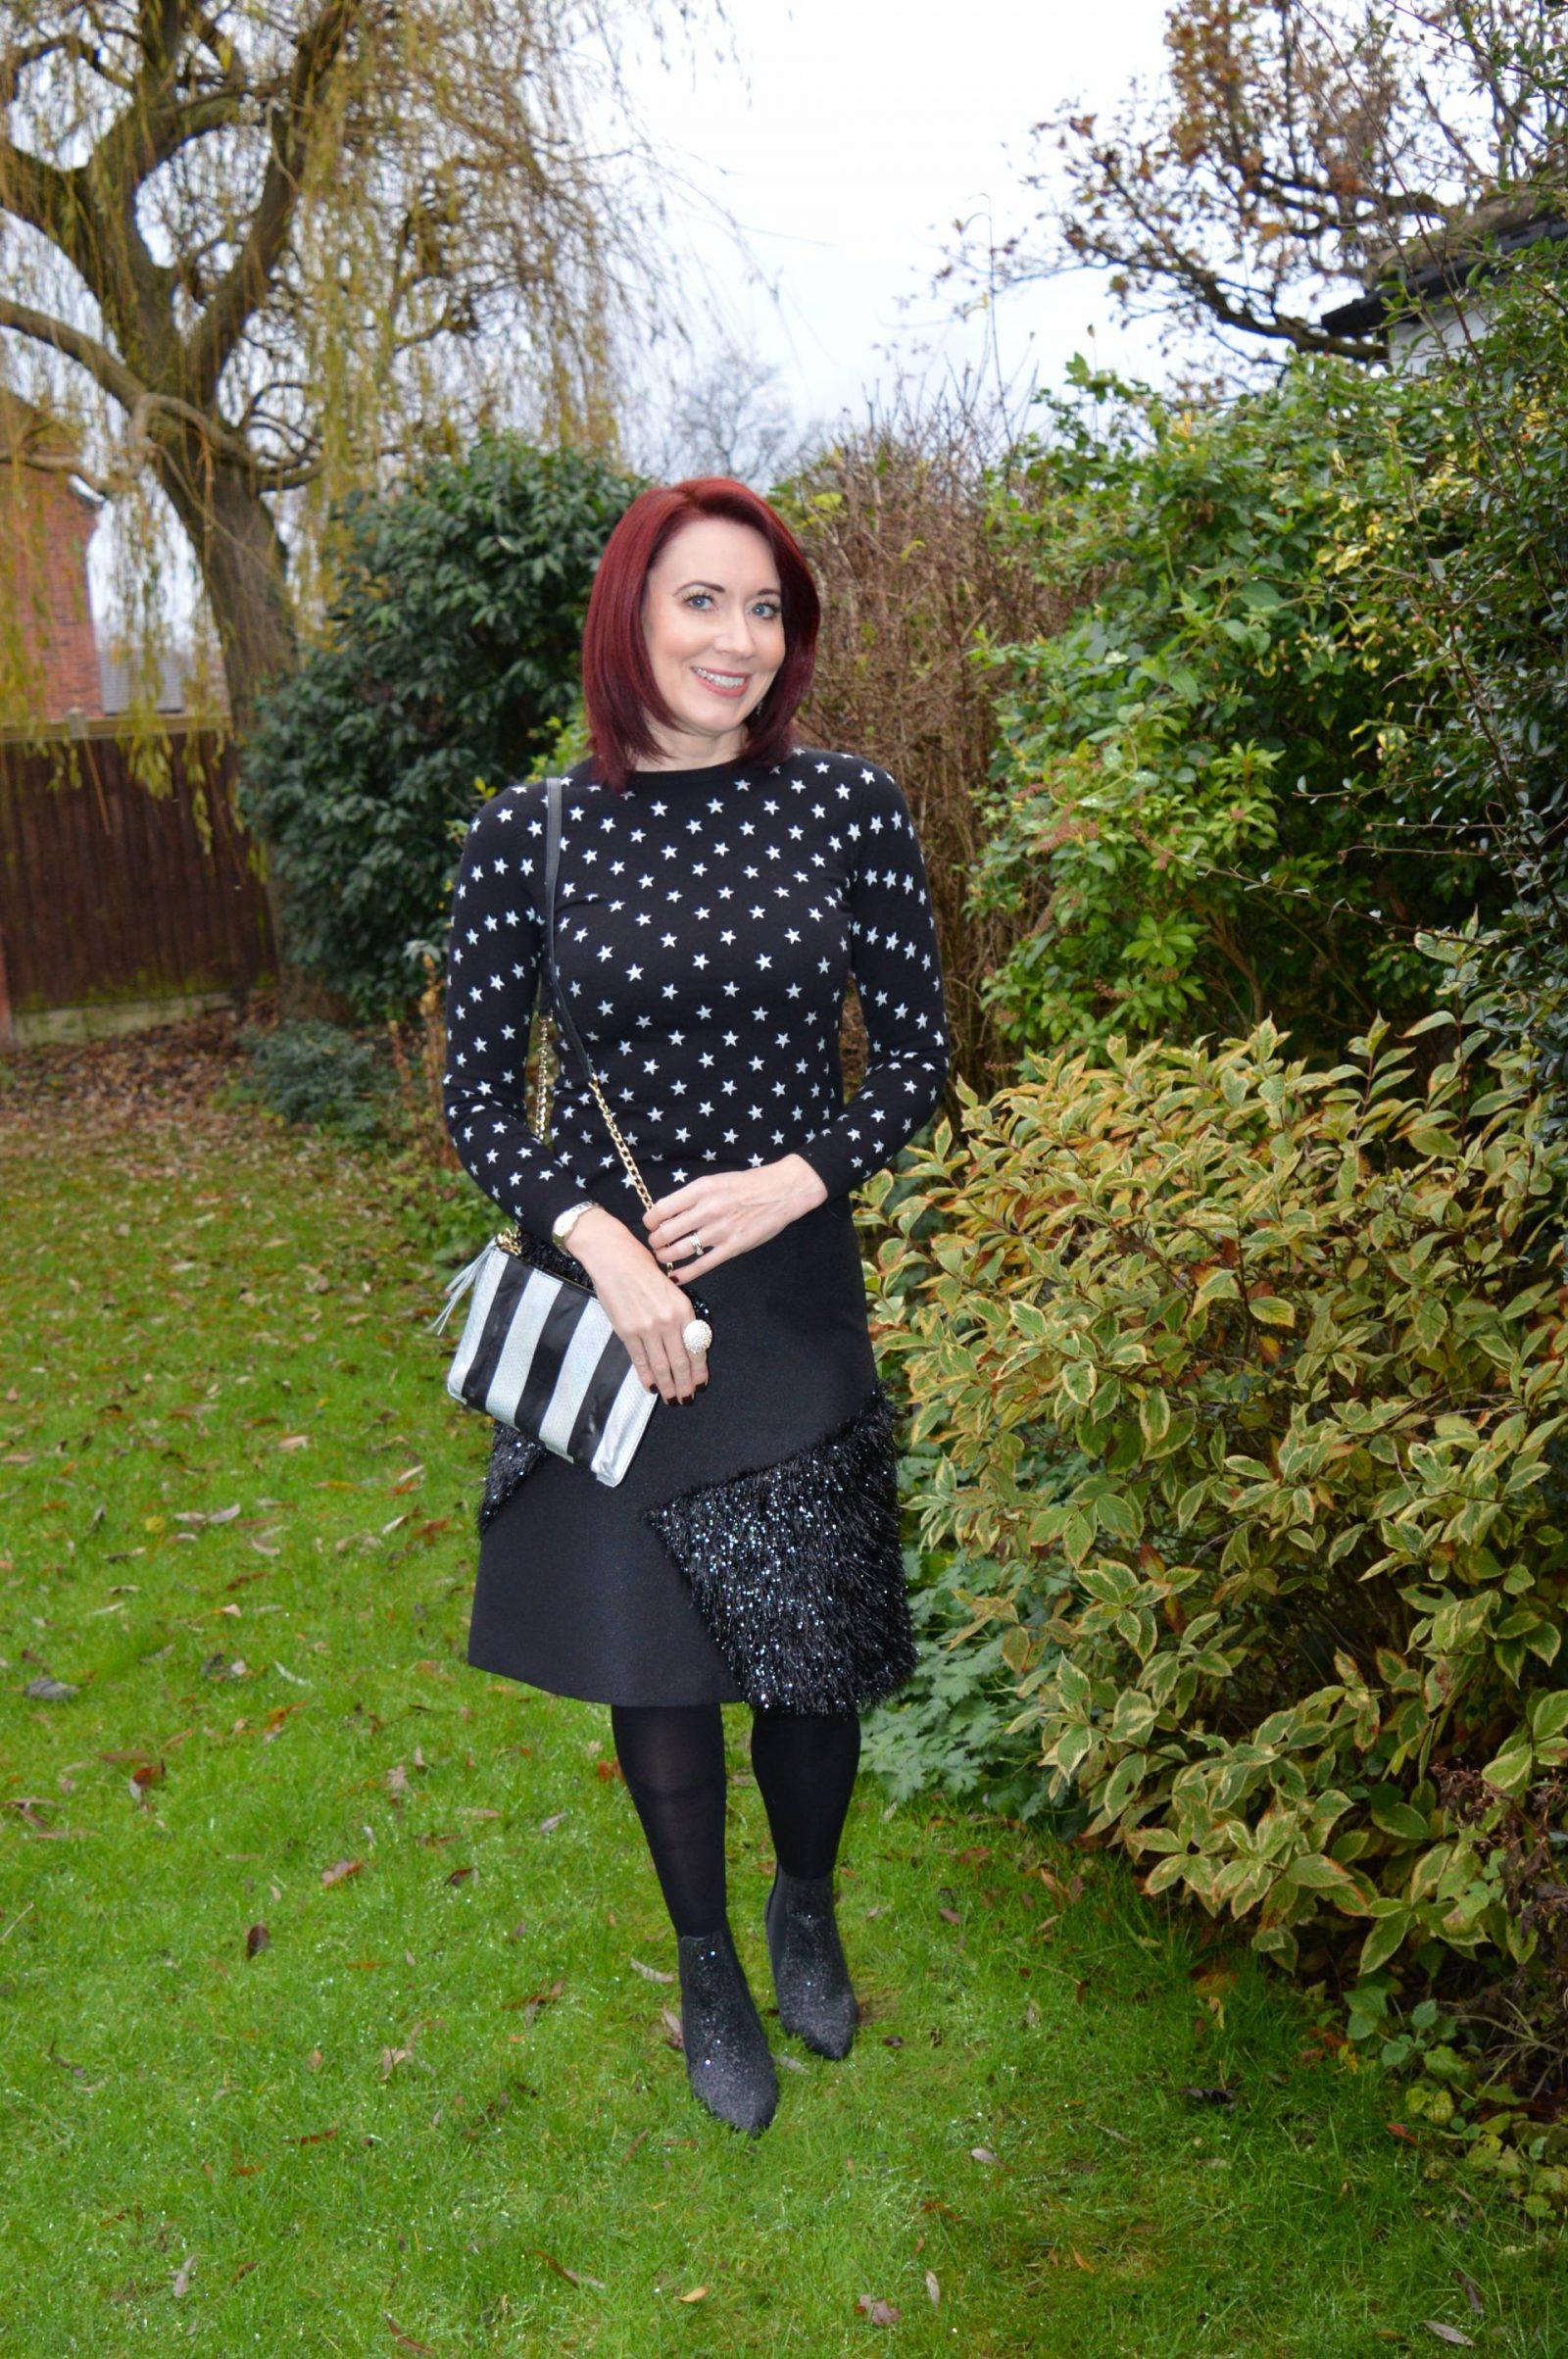 Black Tinsel Skirt, Glitter Boots and Star Jumper